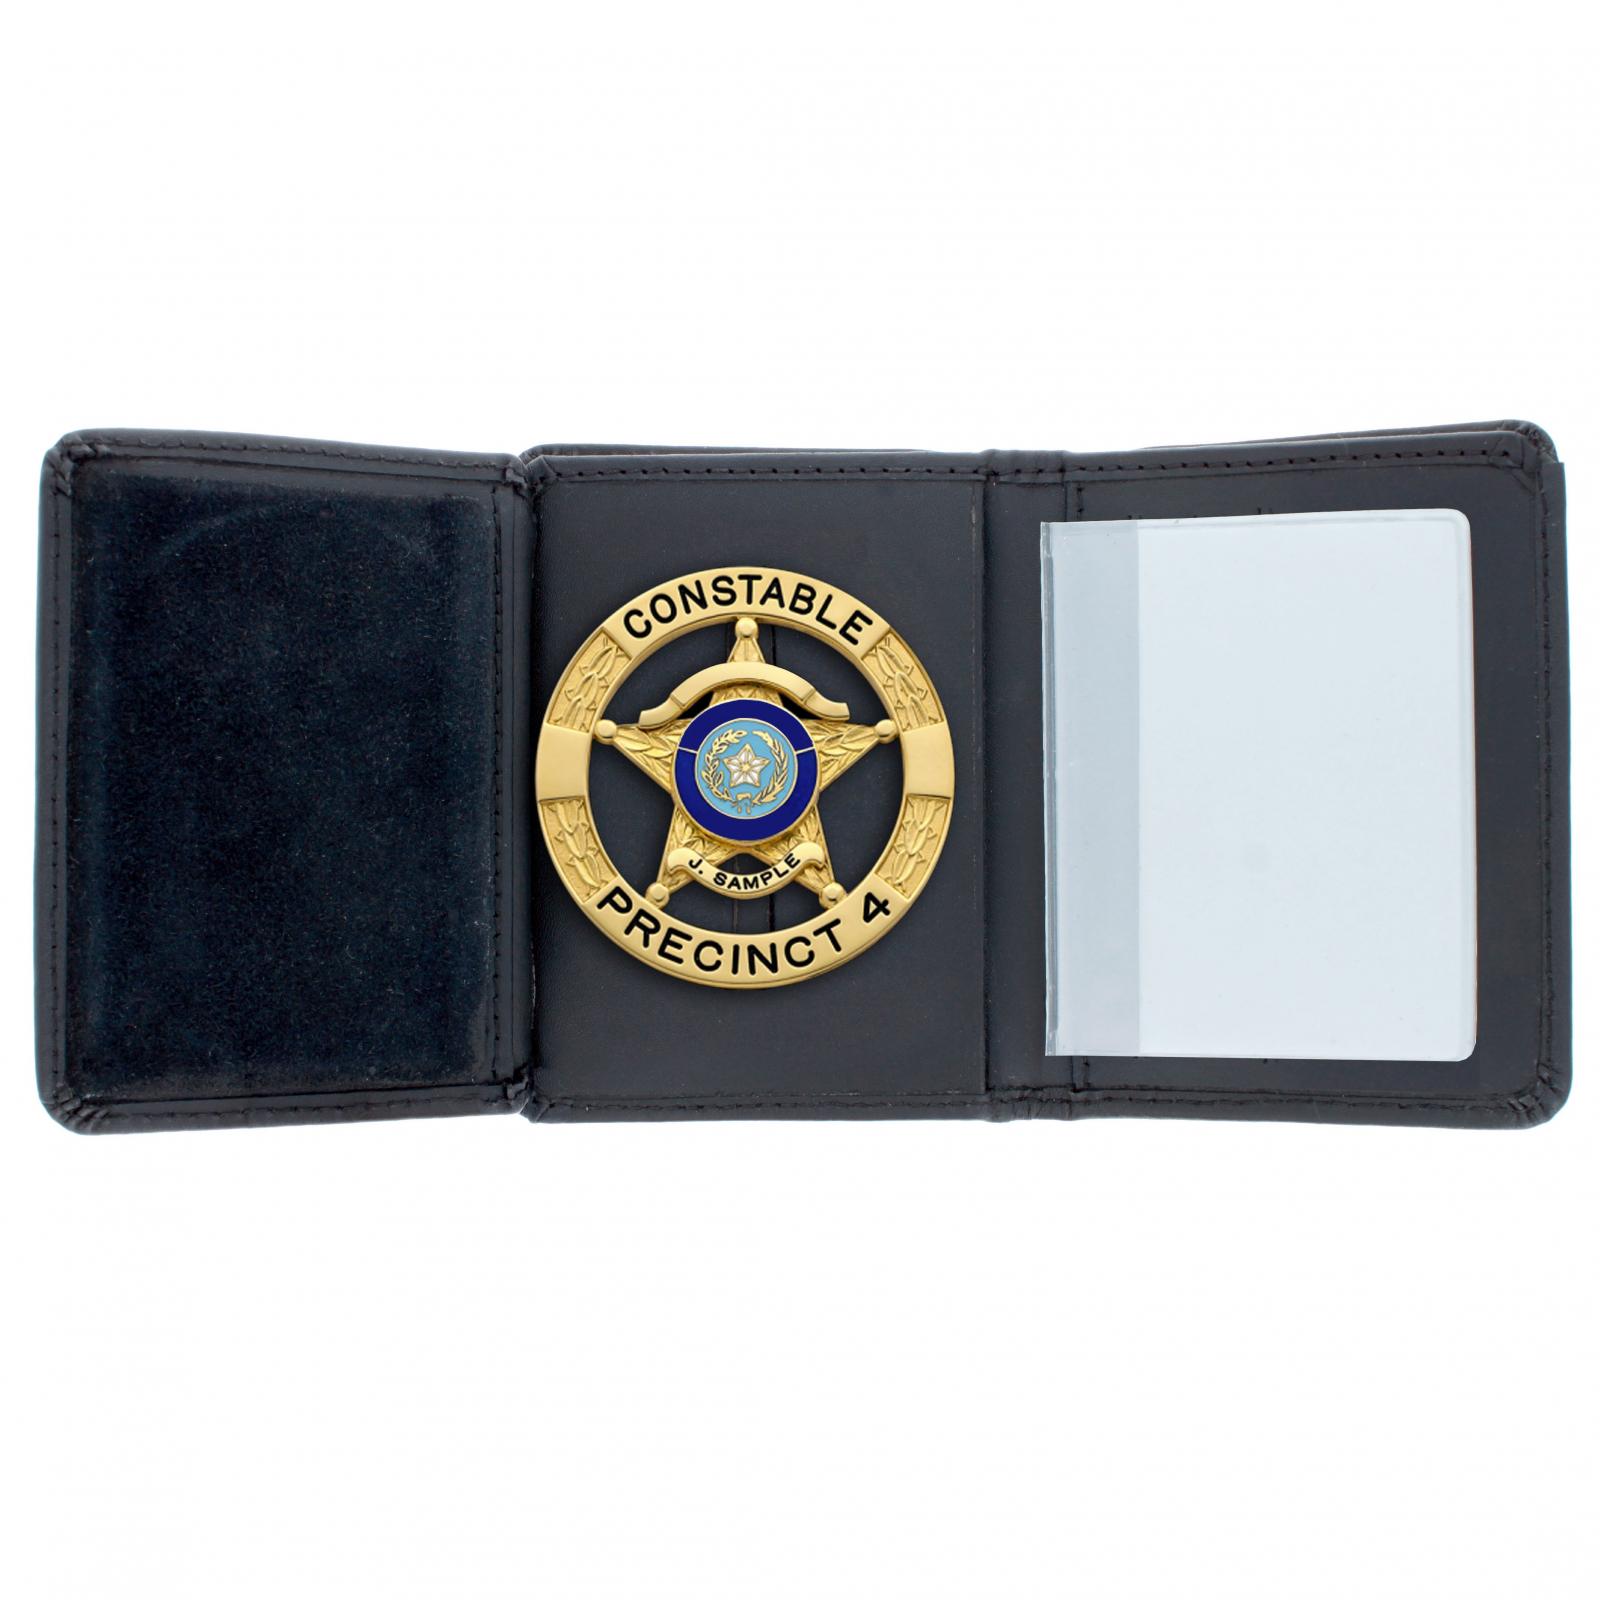 ASR Federal Law Enforcement RFID Leather Hidden Badge Folding Wallet - Round